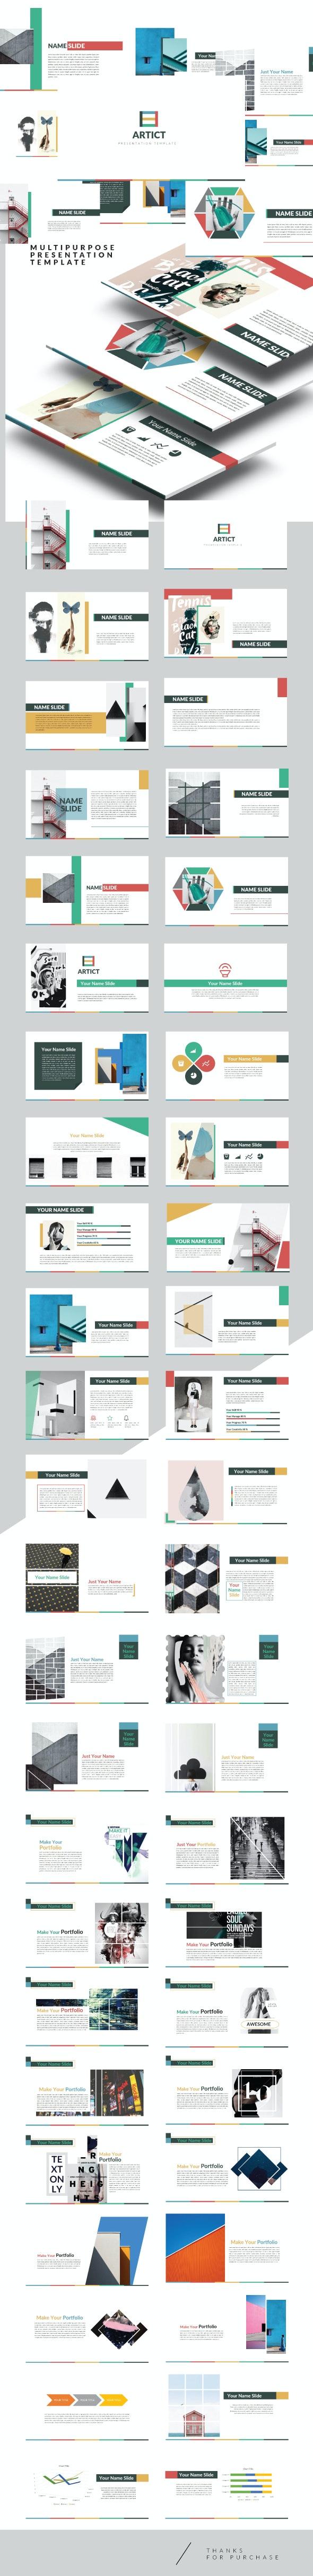 Artic - Multipurpose Keynote Creative template - Creative Keynote Templates